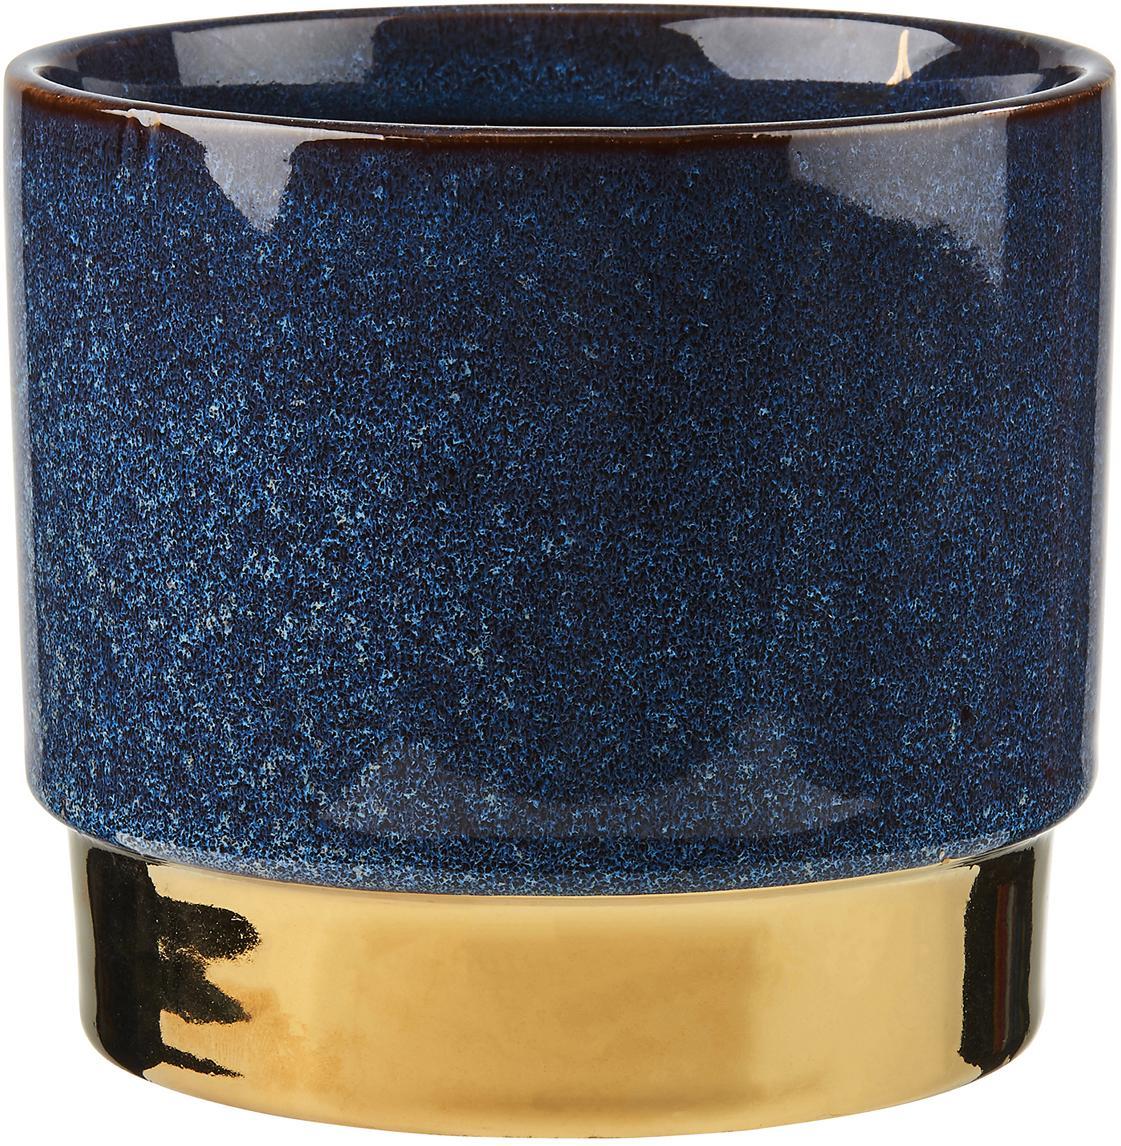 Plantenpot Golden Touch, Keramiek, Blauw, goudkleurig, Ø 15 cm